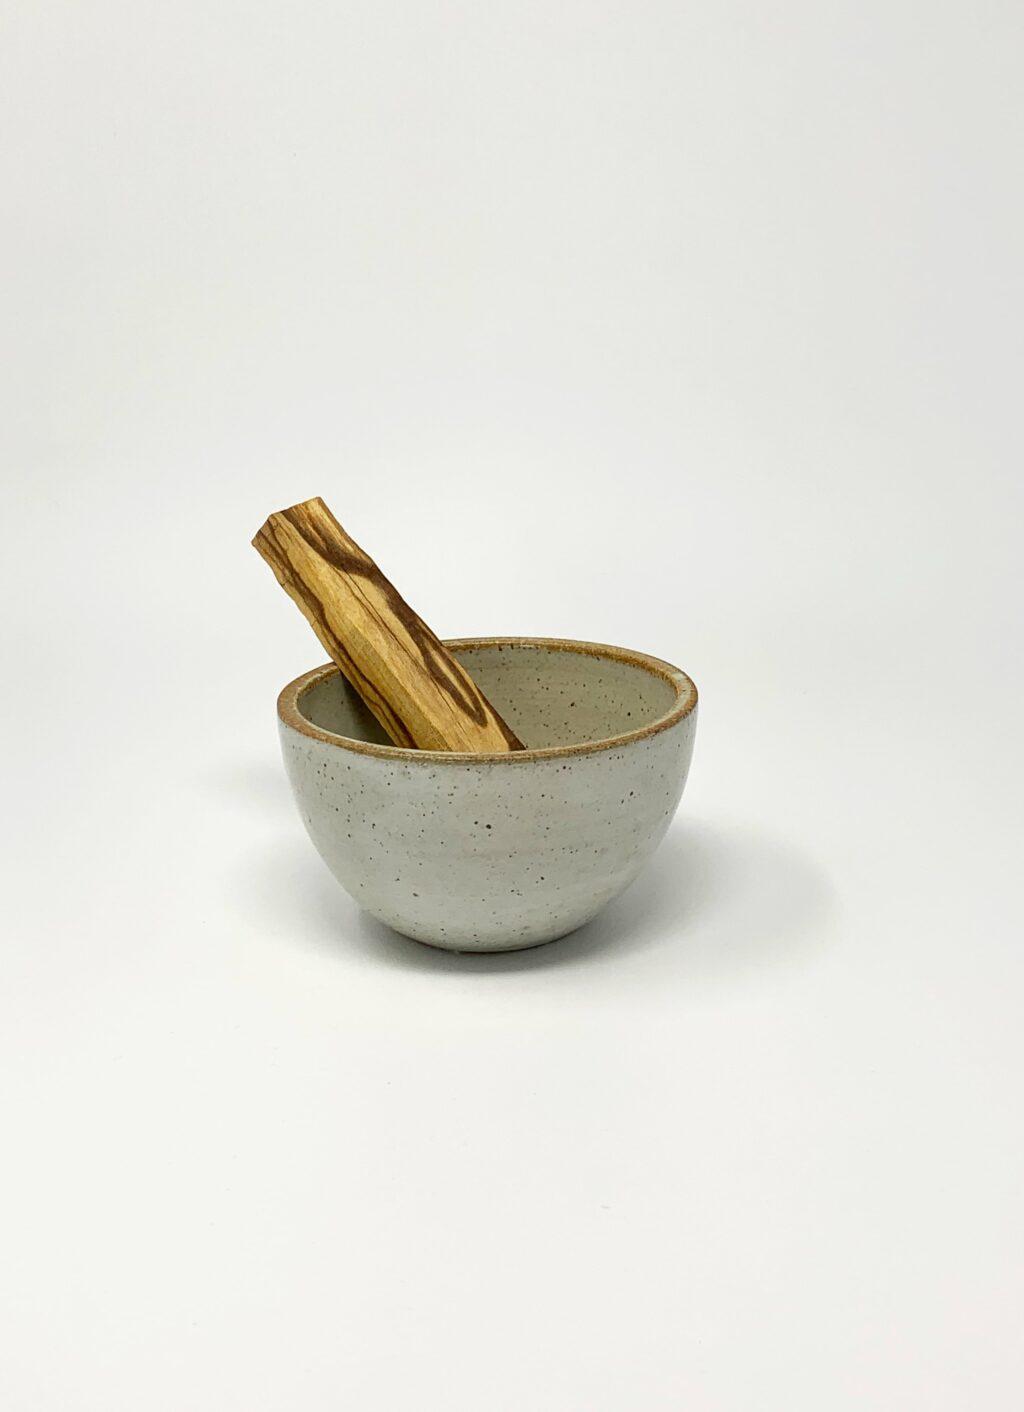 Incausa - Wood Fired Stoneware Smudge Bowl - White - Large